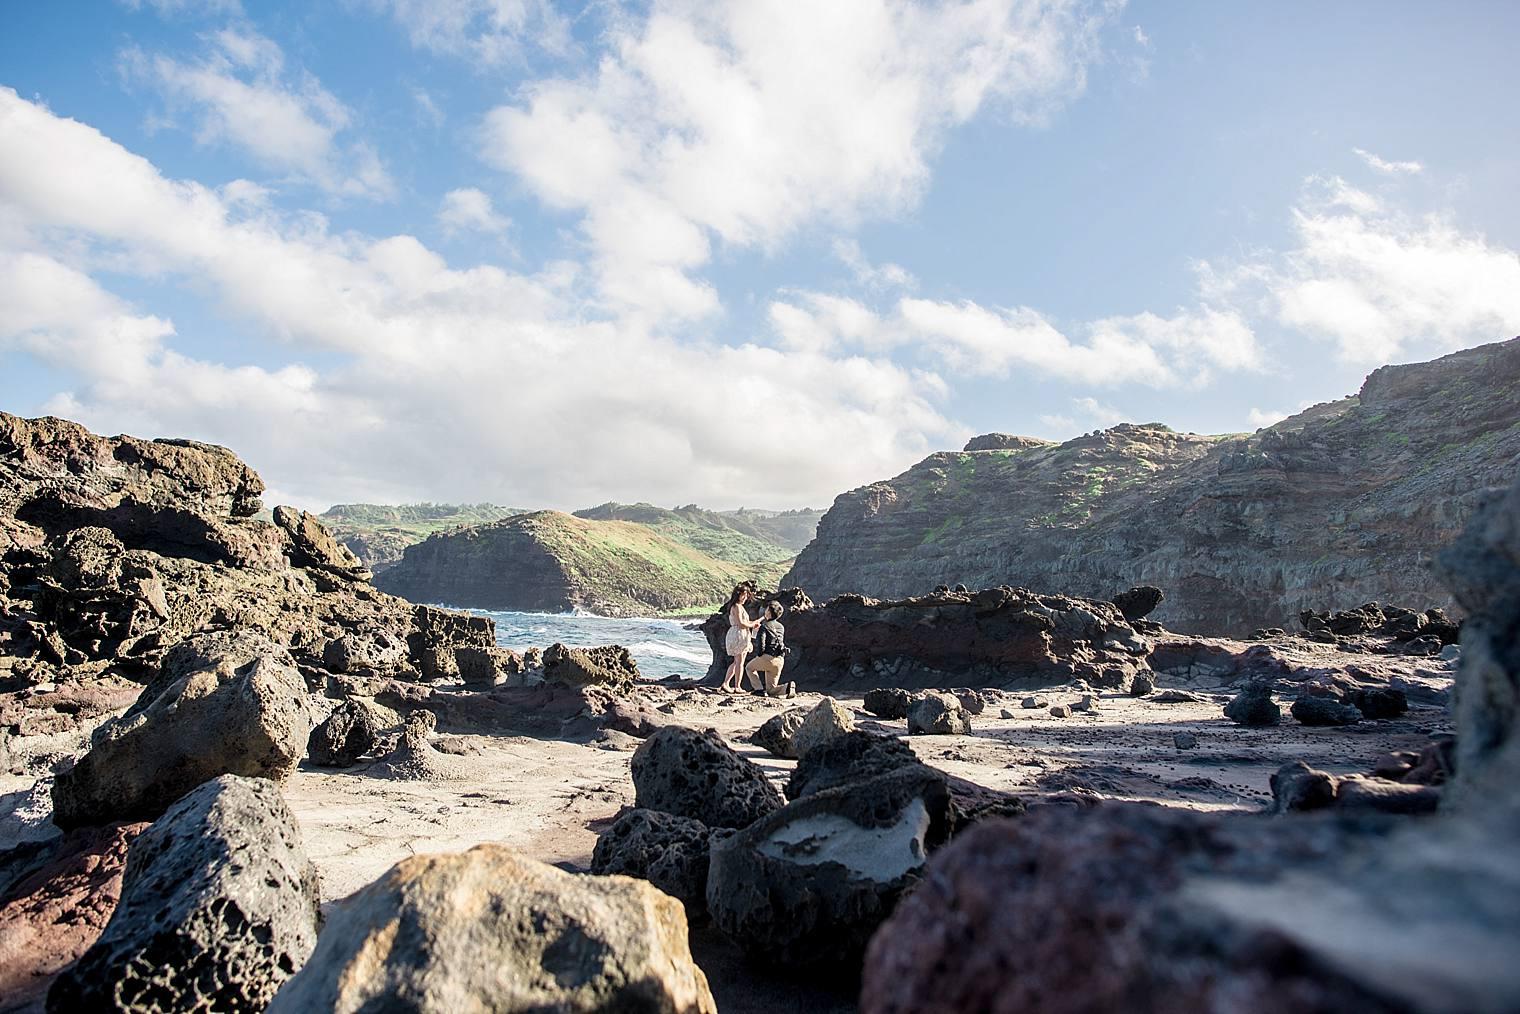 nakalele heart rock proposal in maui, hawaii